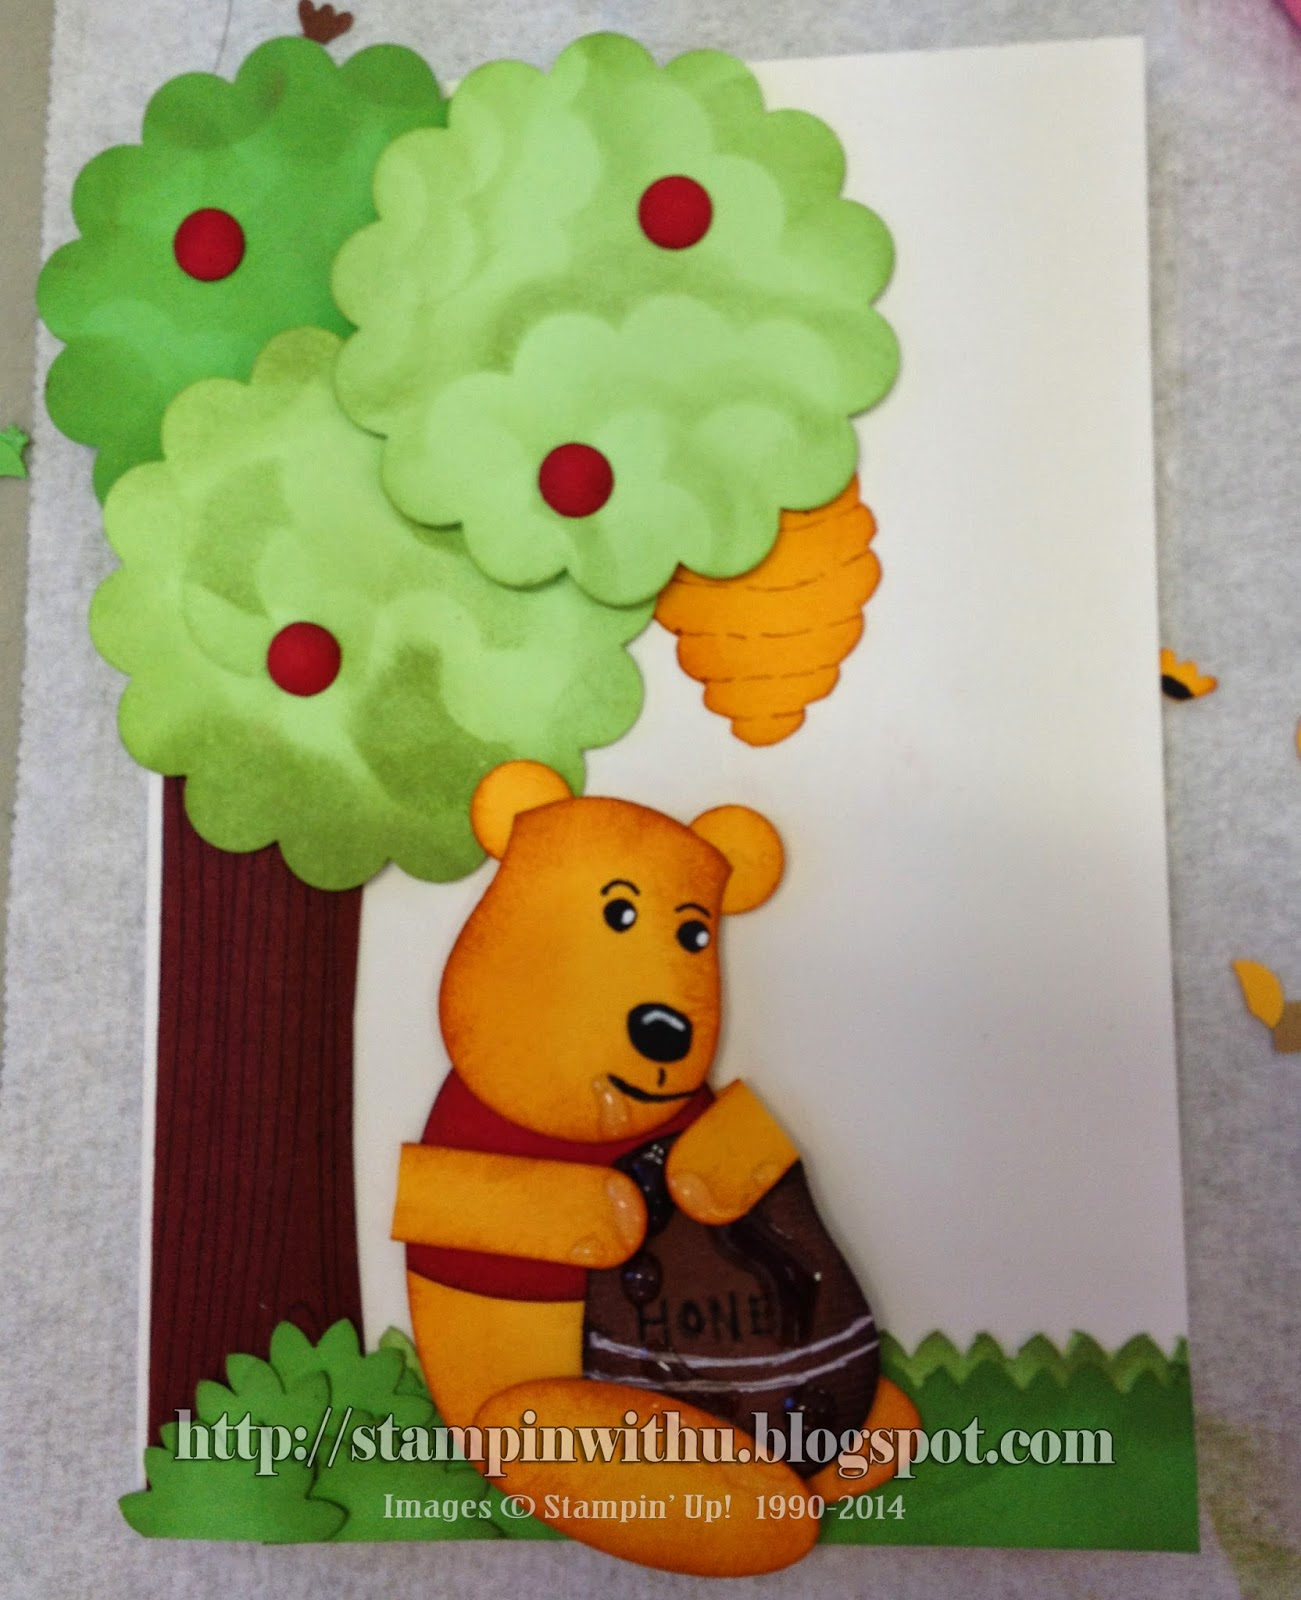 Pooh Bear & Bee Hive